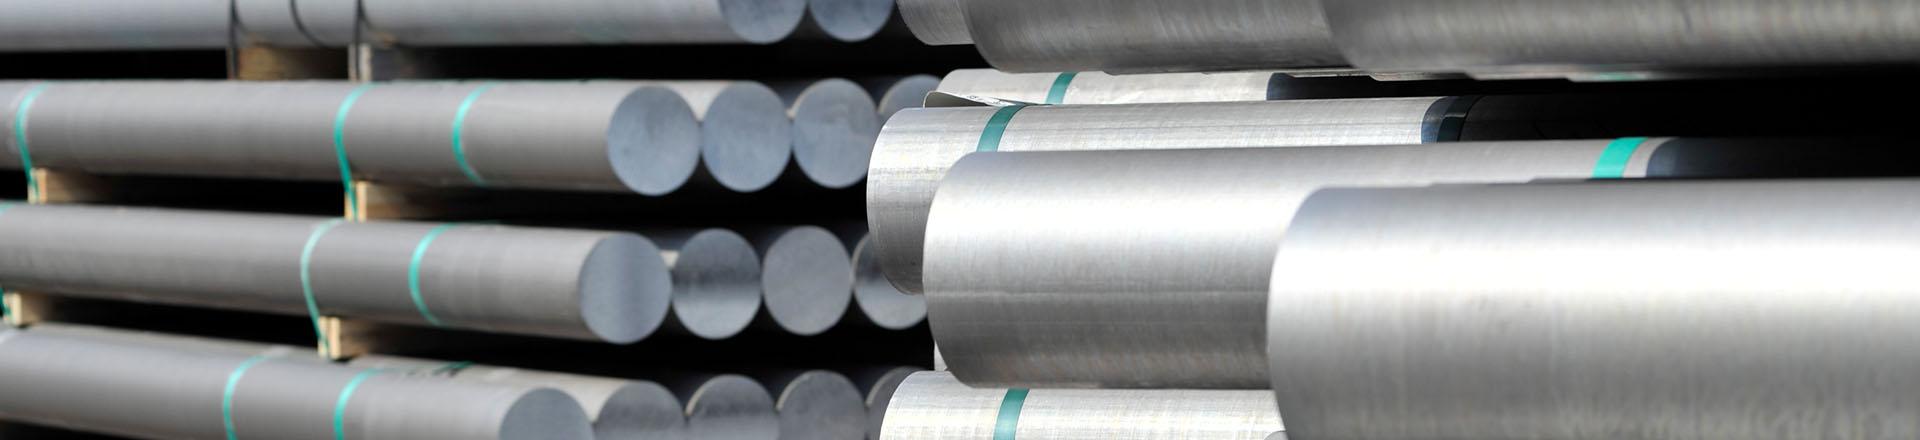 aluminumprodukte umschmelzen